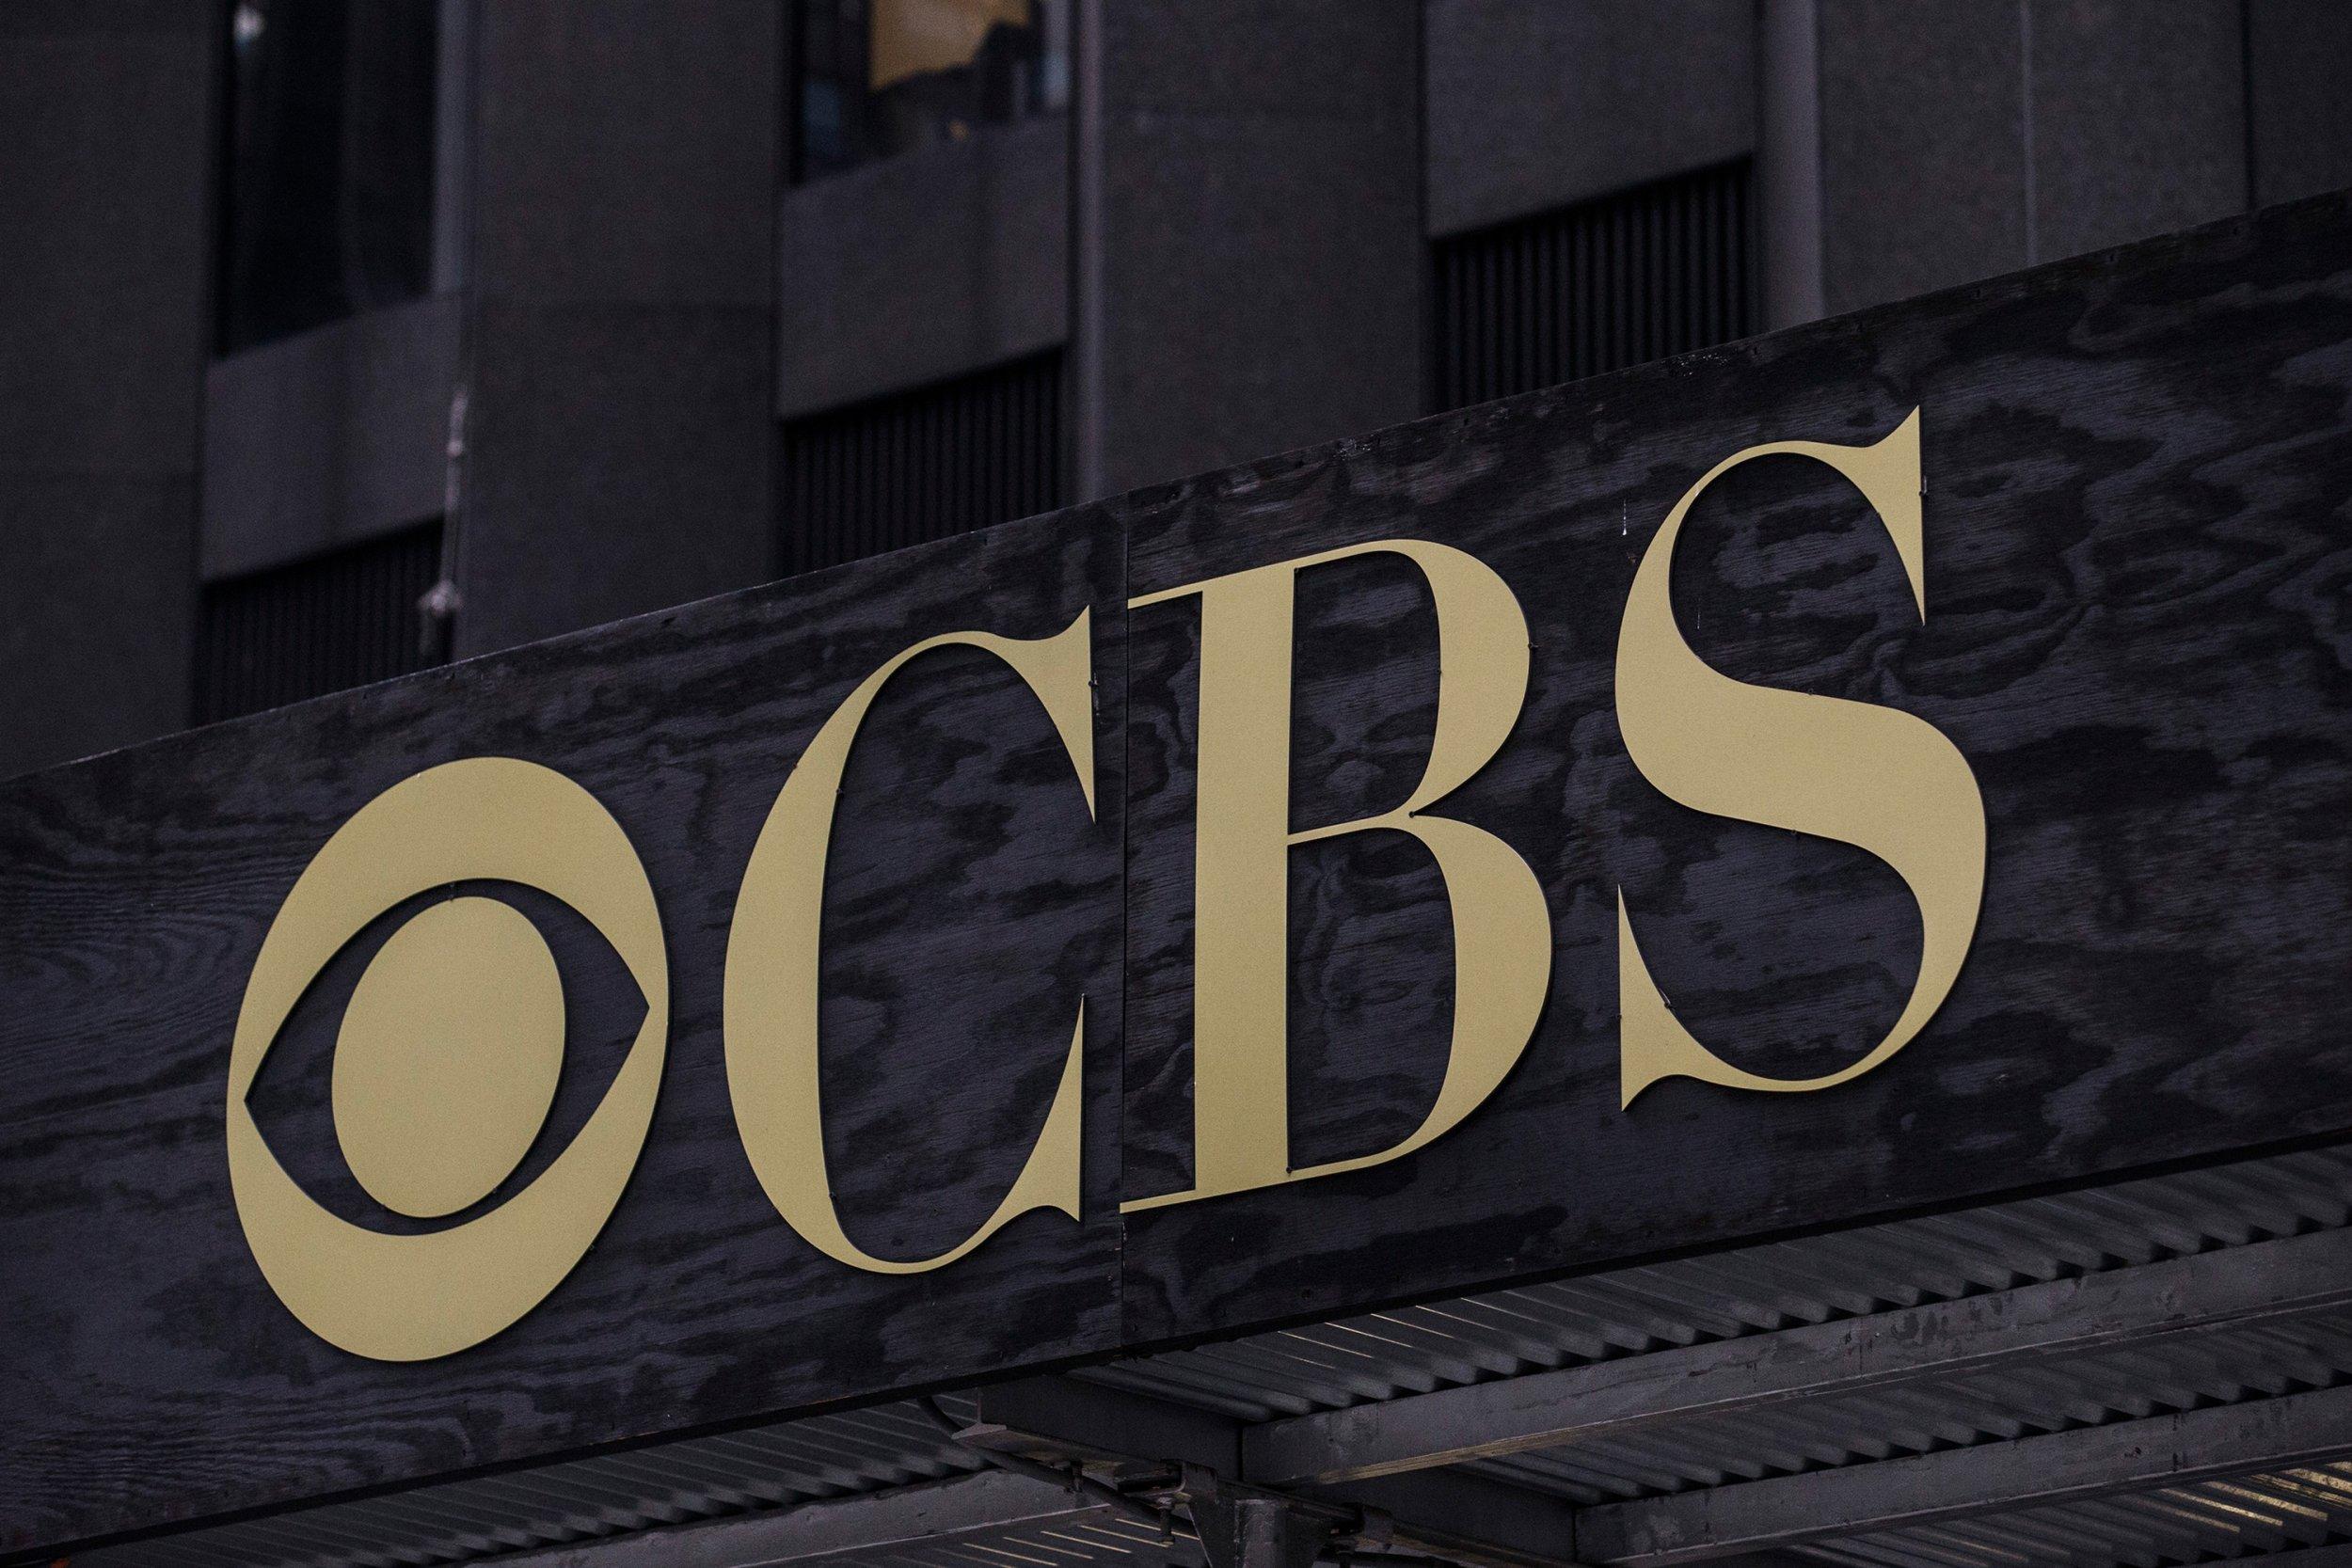 CBS sues man for posting Gunsmoke screenshot on social media